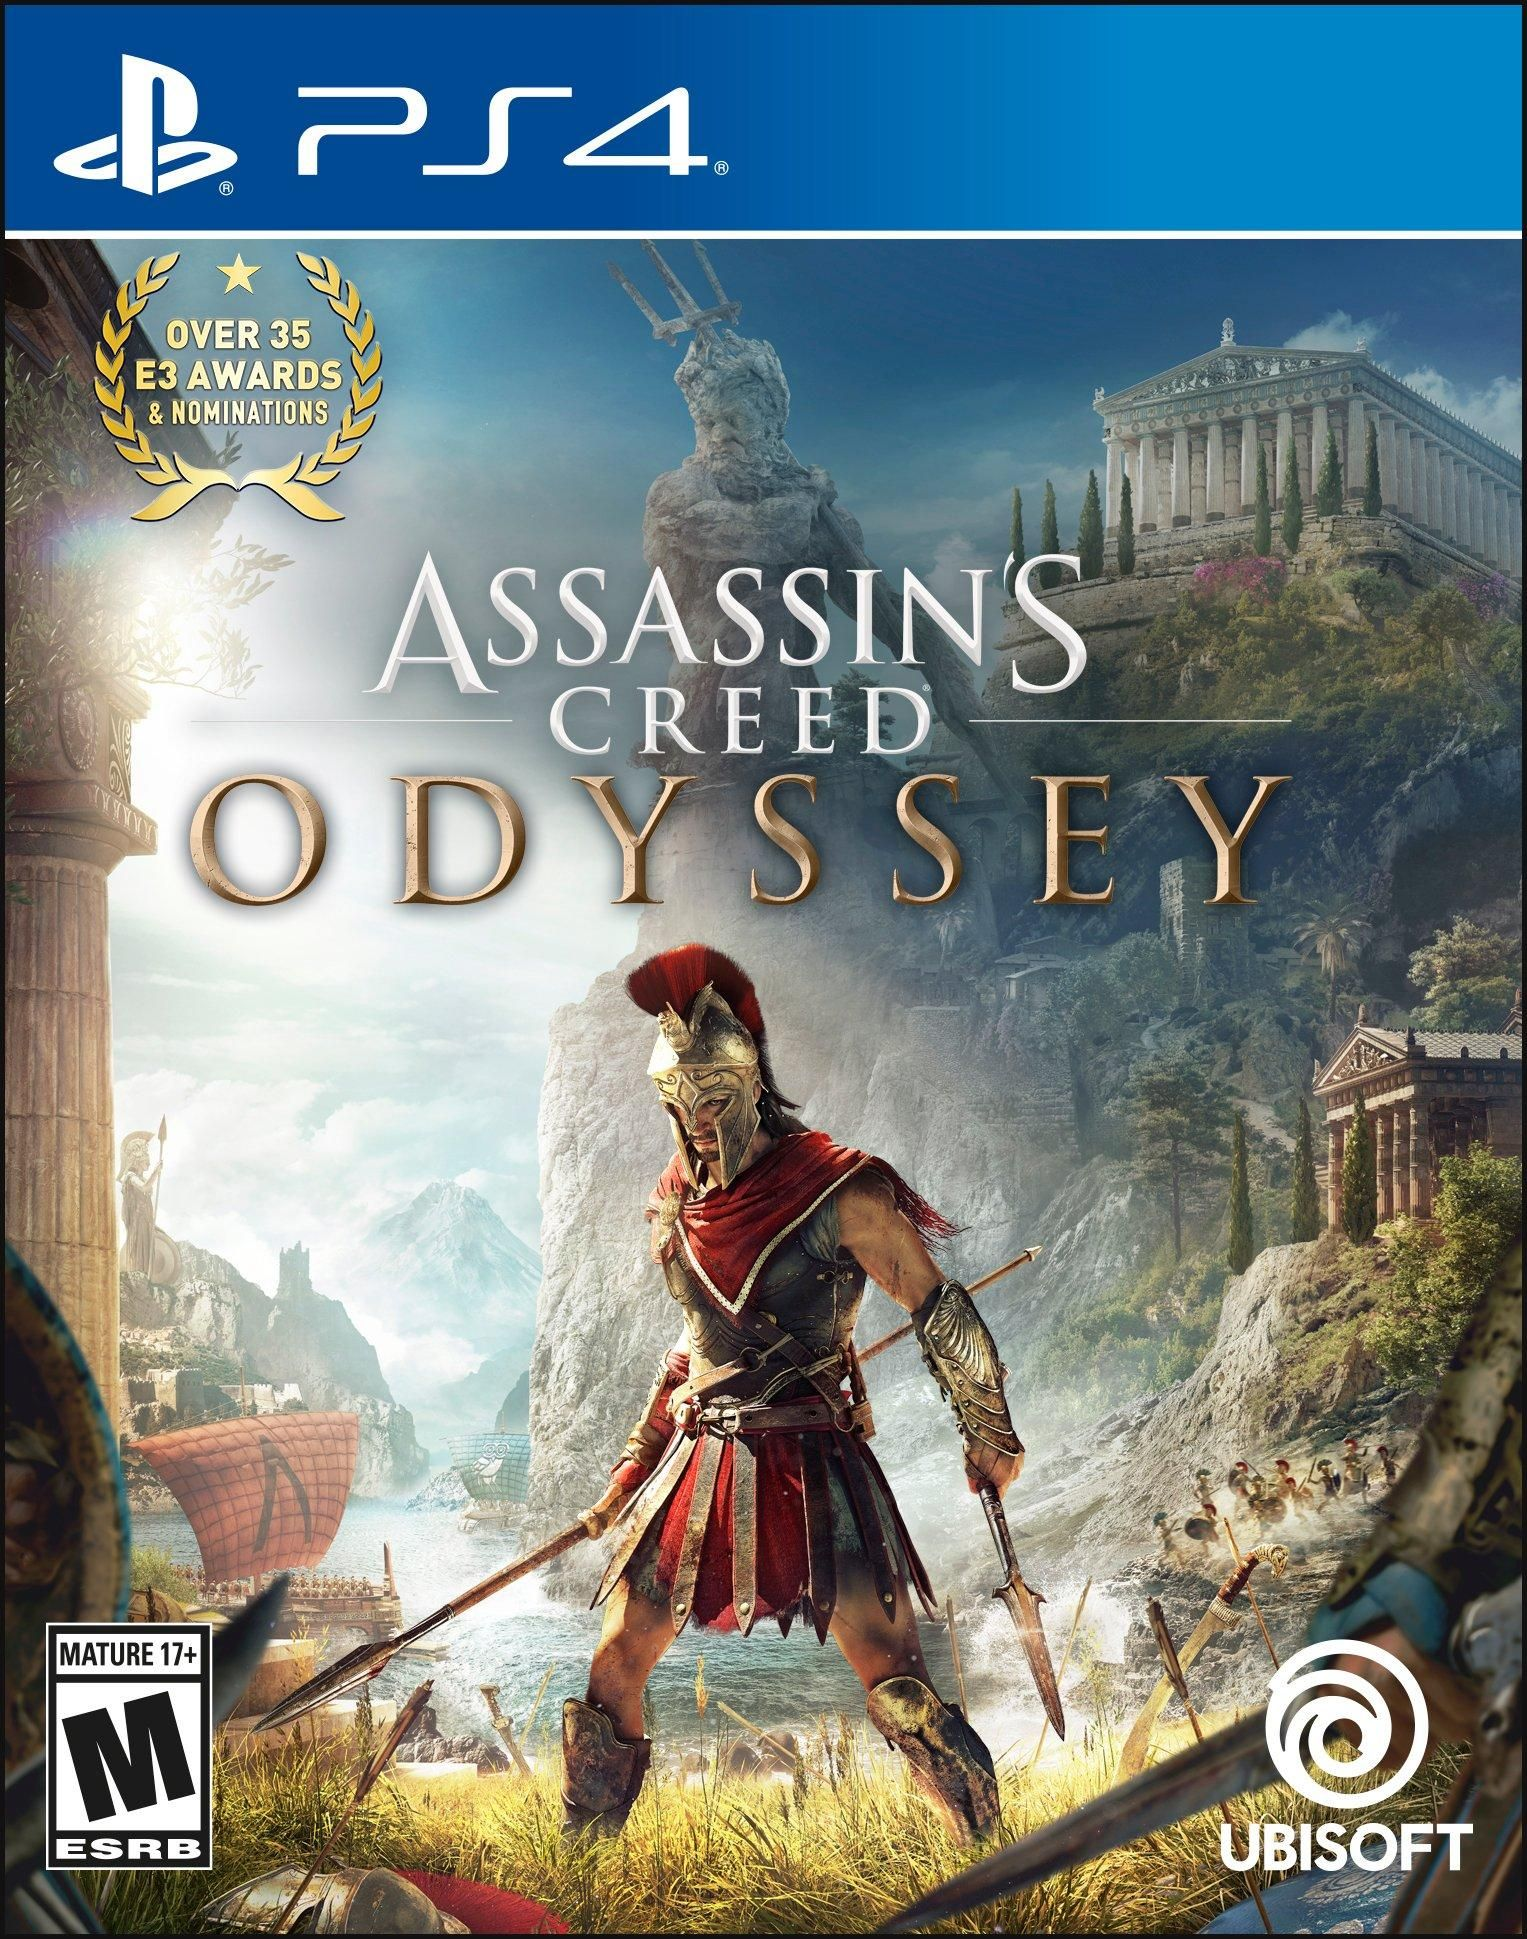 Assassin S Creed Odysseyplaystation 4 Gamestop Assassins Creed Odyssey Assassin S Creed Assassins Creed